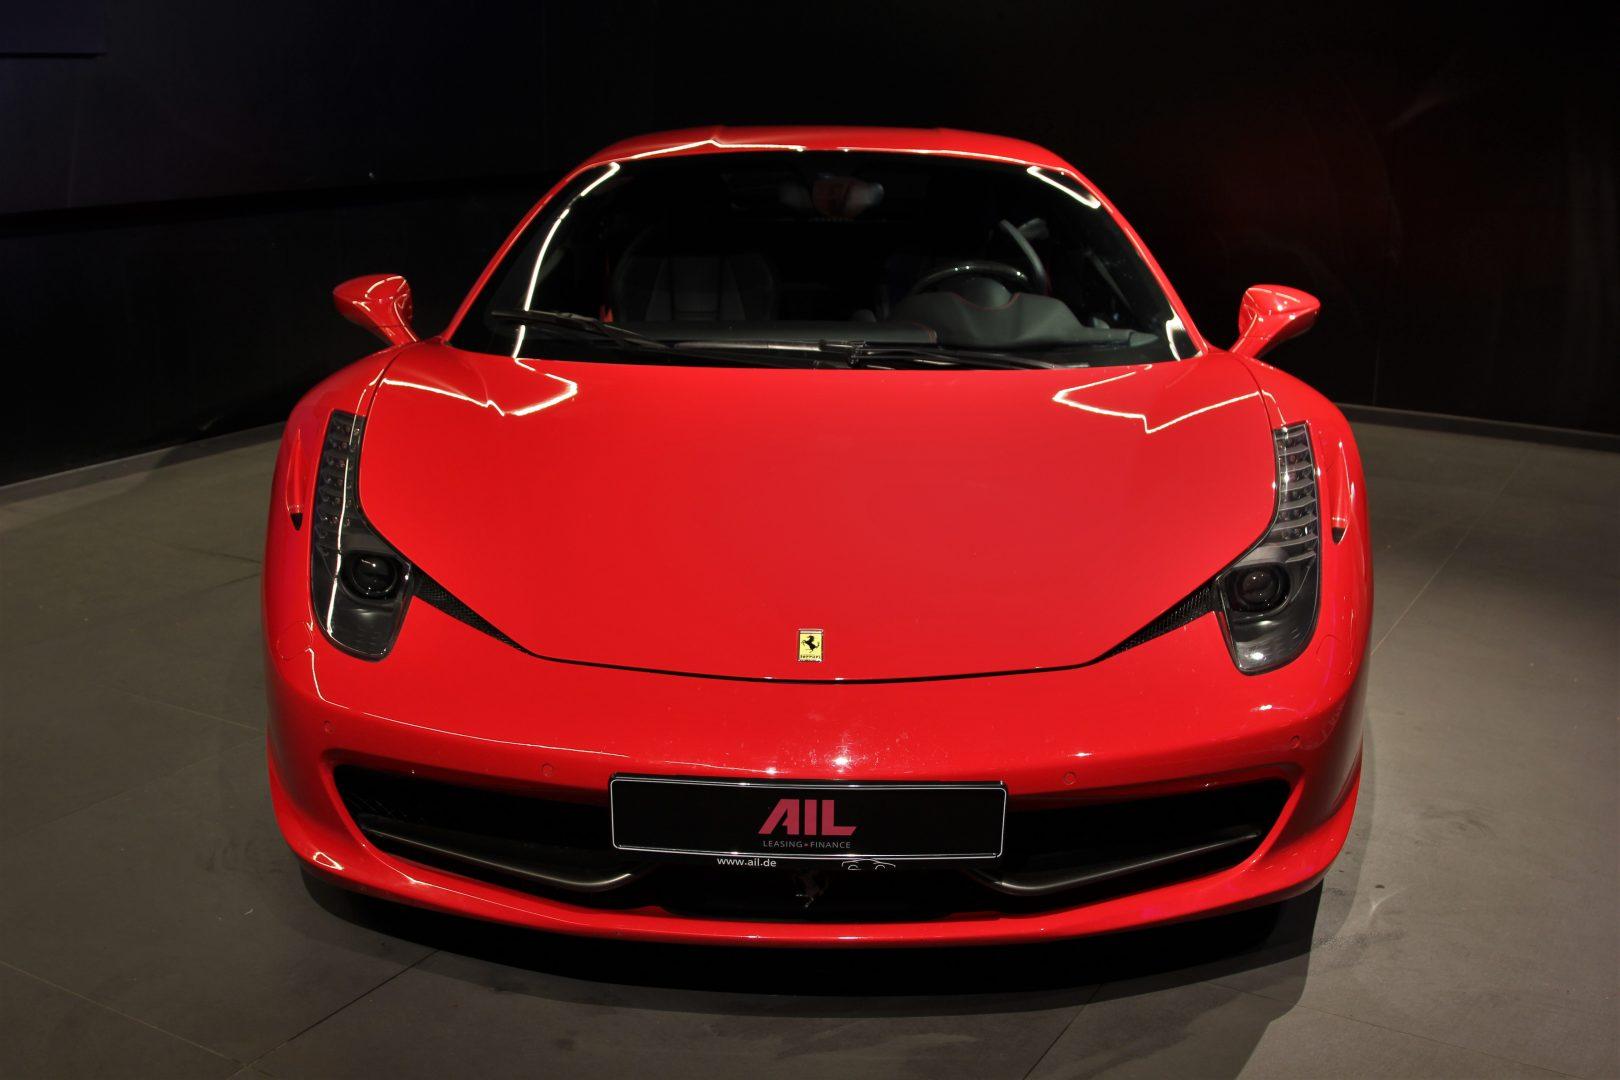 AIL Ferrari 458 Italia 10